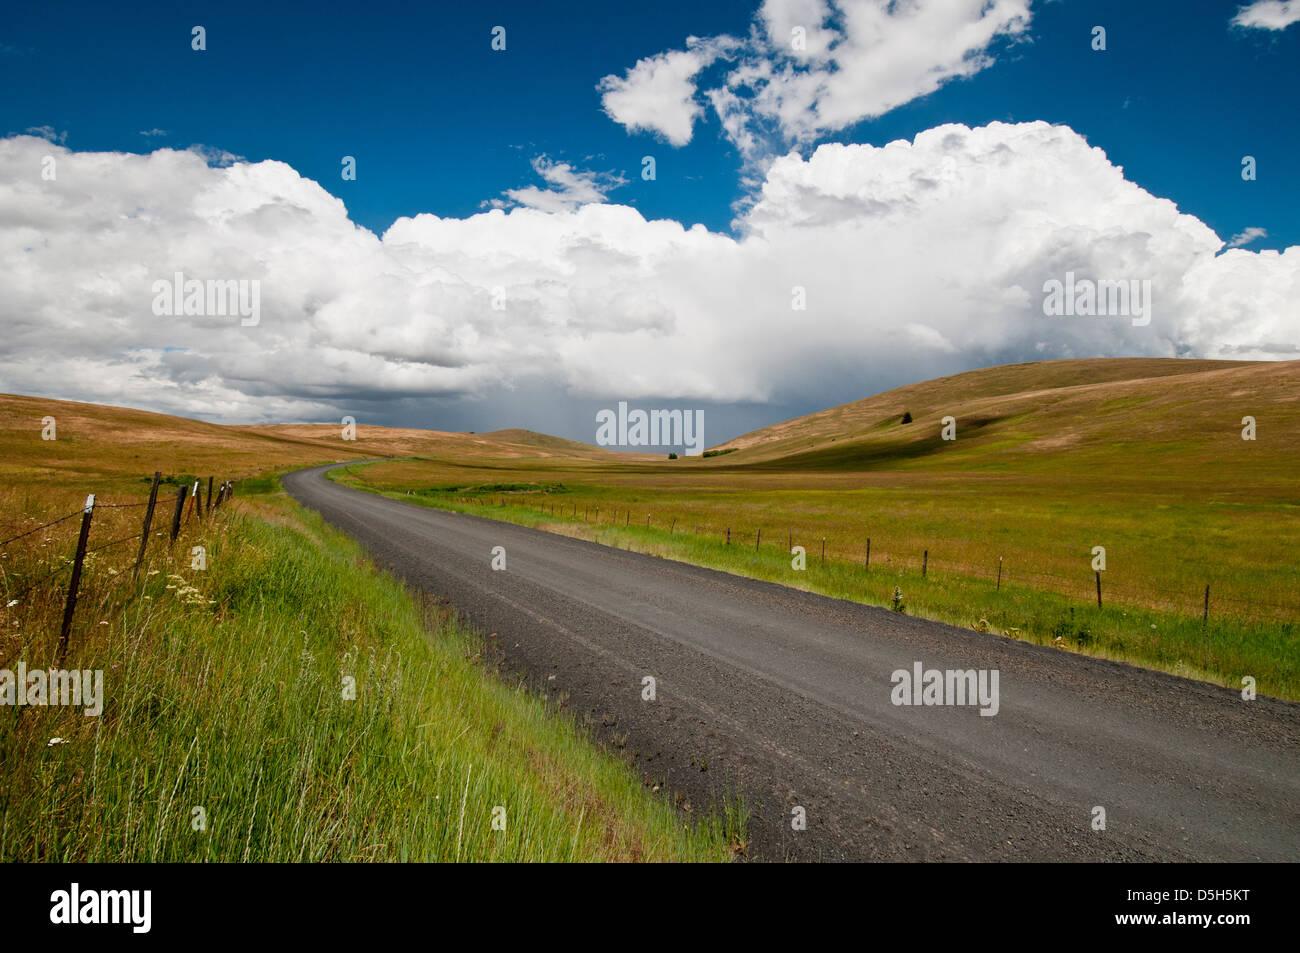 Zumwalt Prairie in NE Oregon - Stock Image